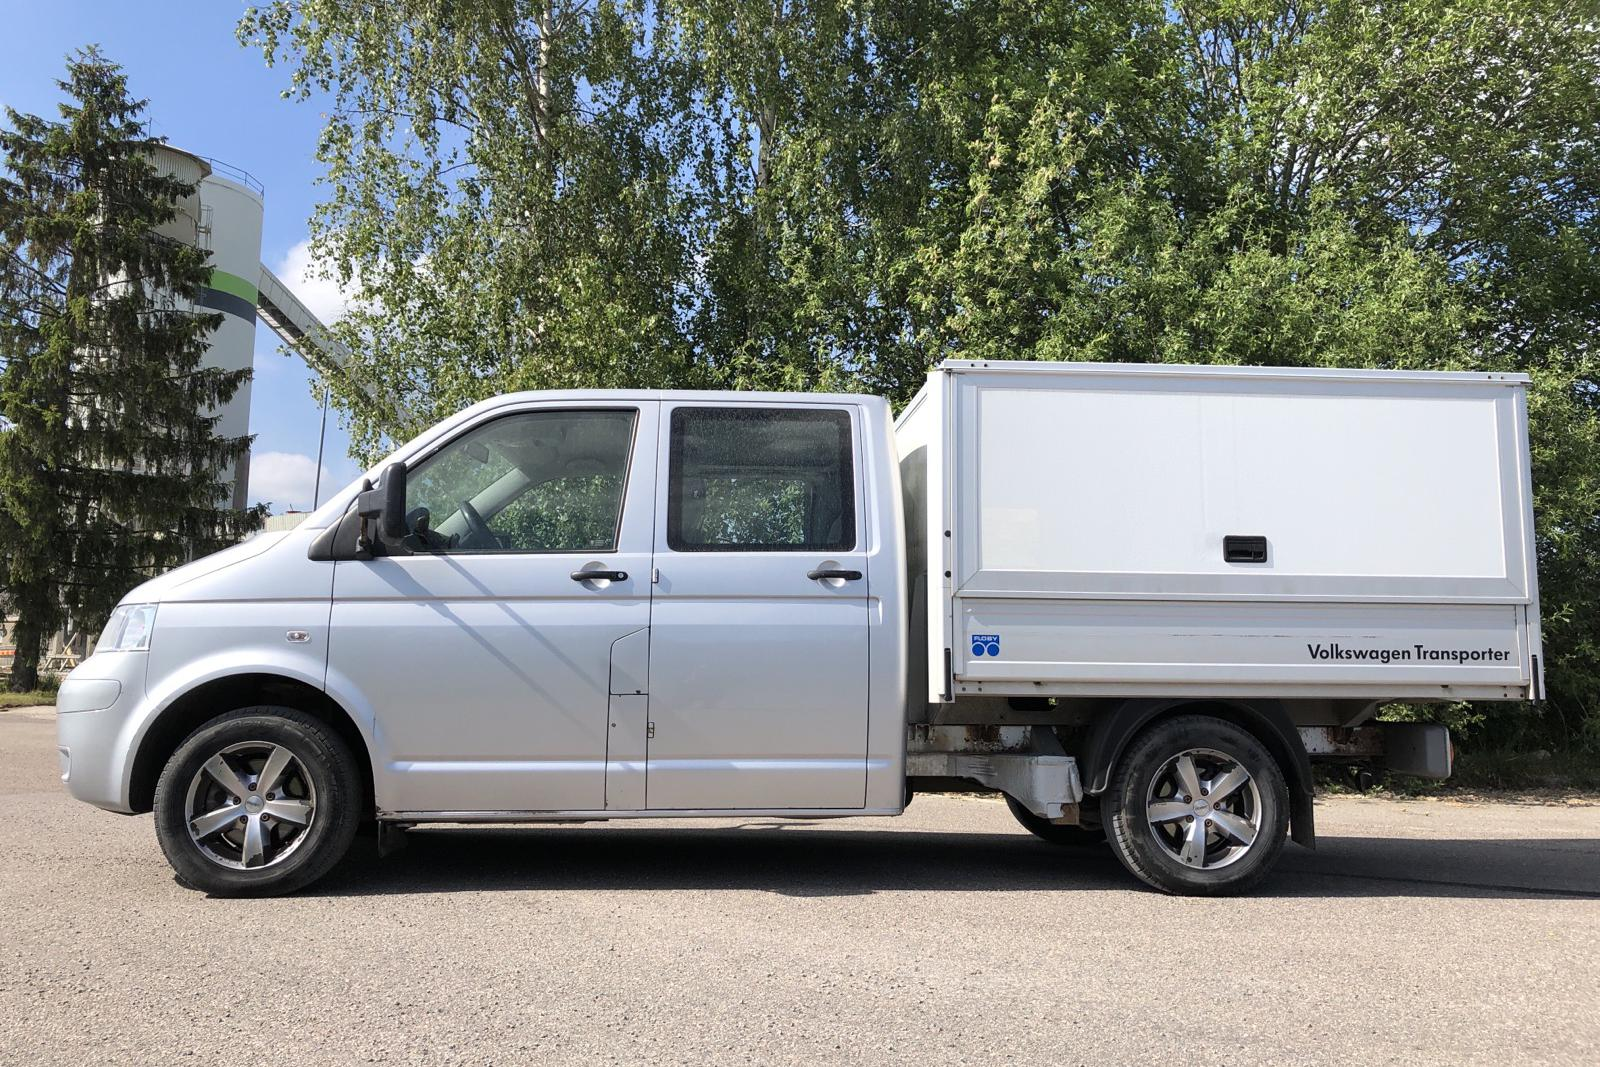 VW Transporter T5 2.5 TDI Pickup (130hk) - 258 660 km - Manual - silver - 2008